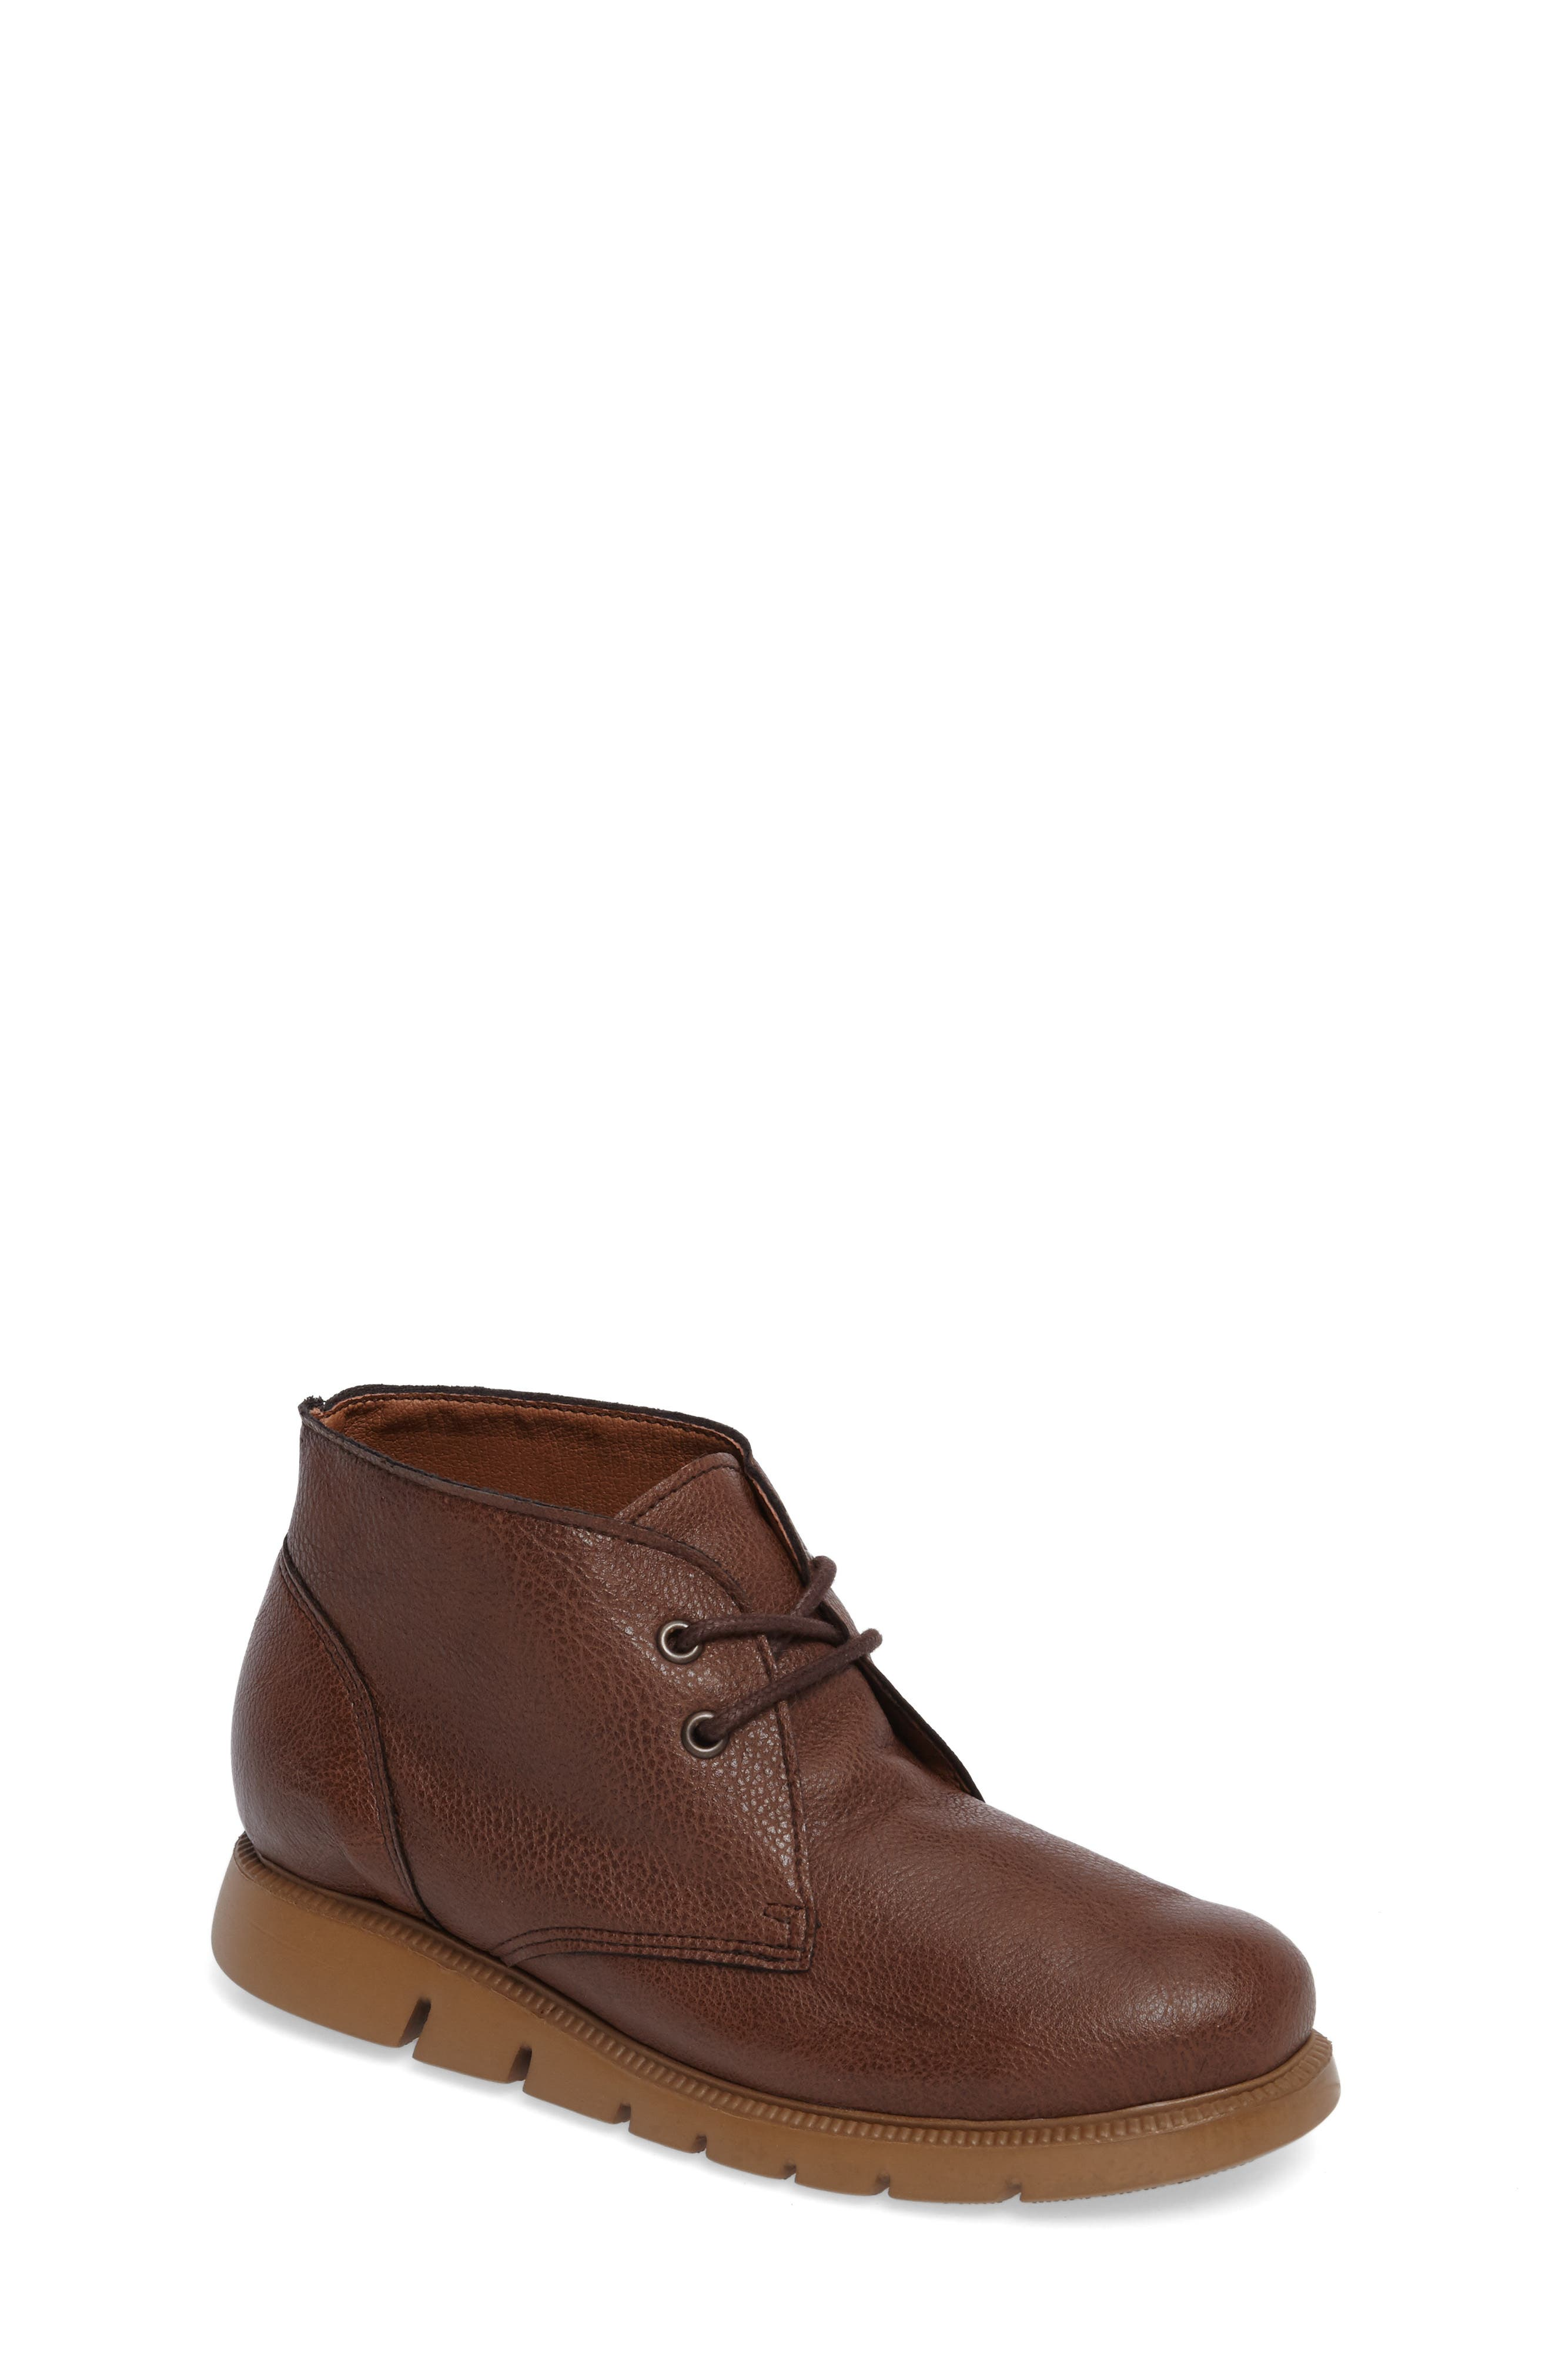 Weslie Chukka Boot,                         Main,                         color, 200